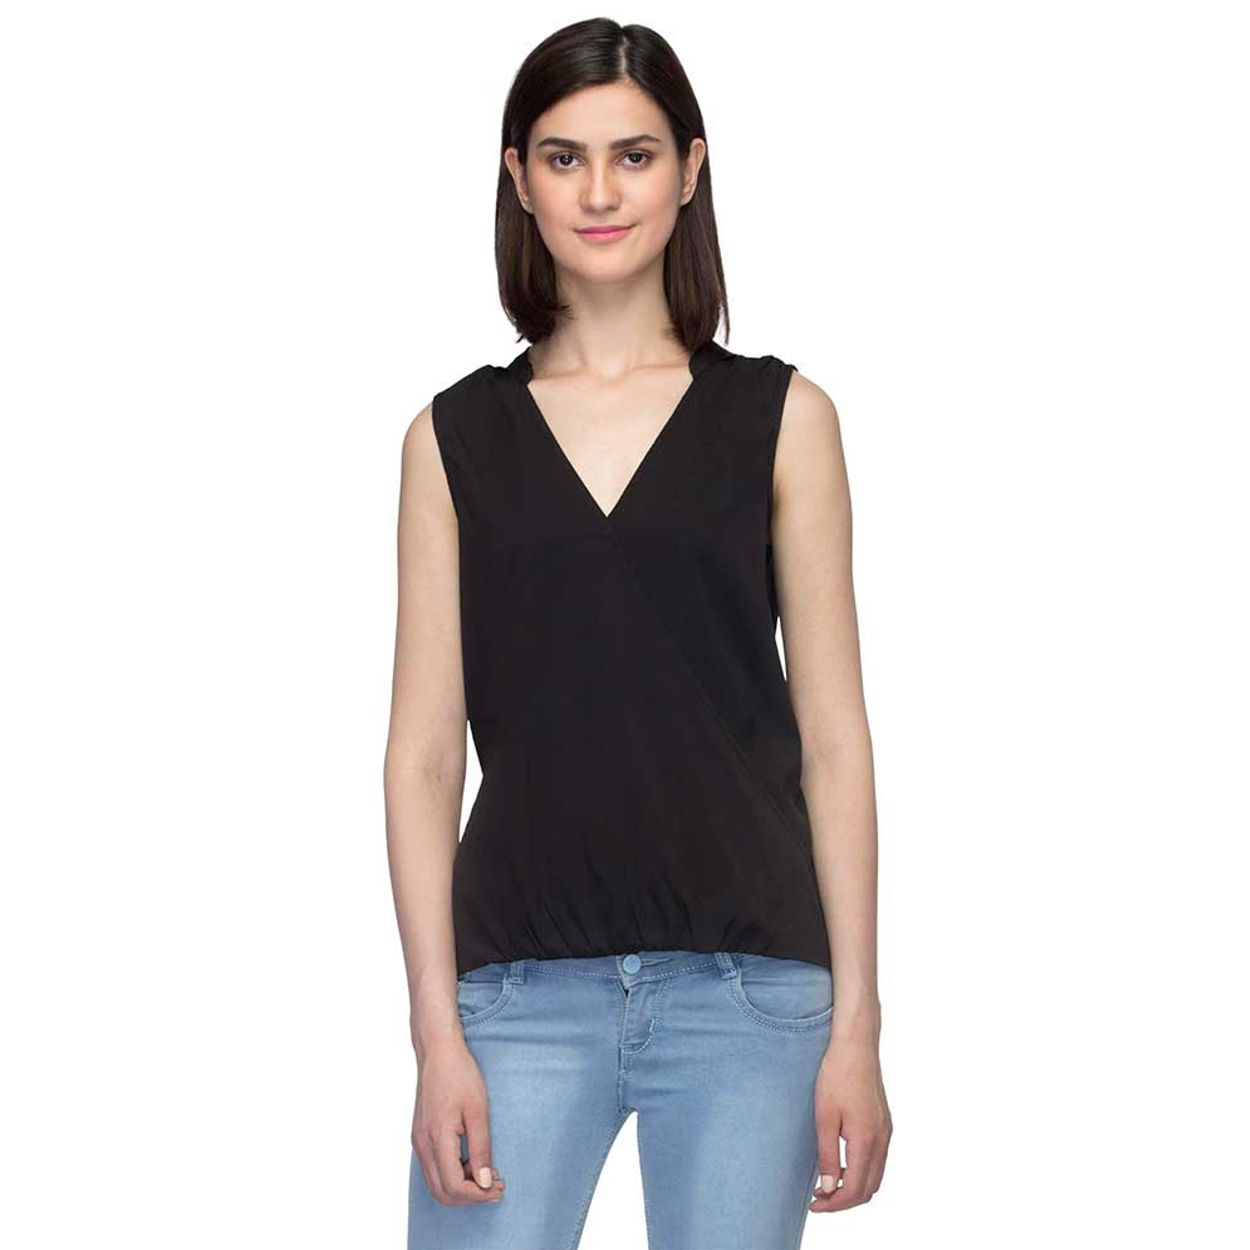 ec7c71b3745f2b Buy Oxolloxo Black V-neck Sleeveless Top